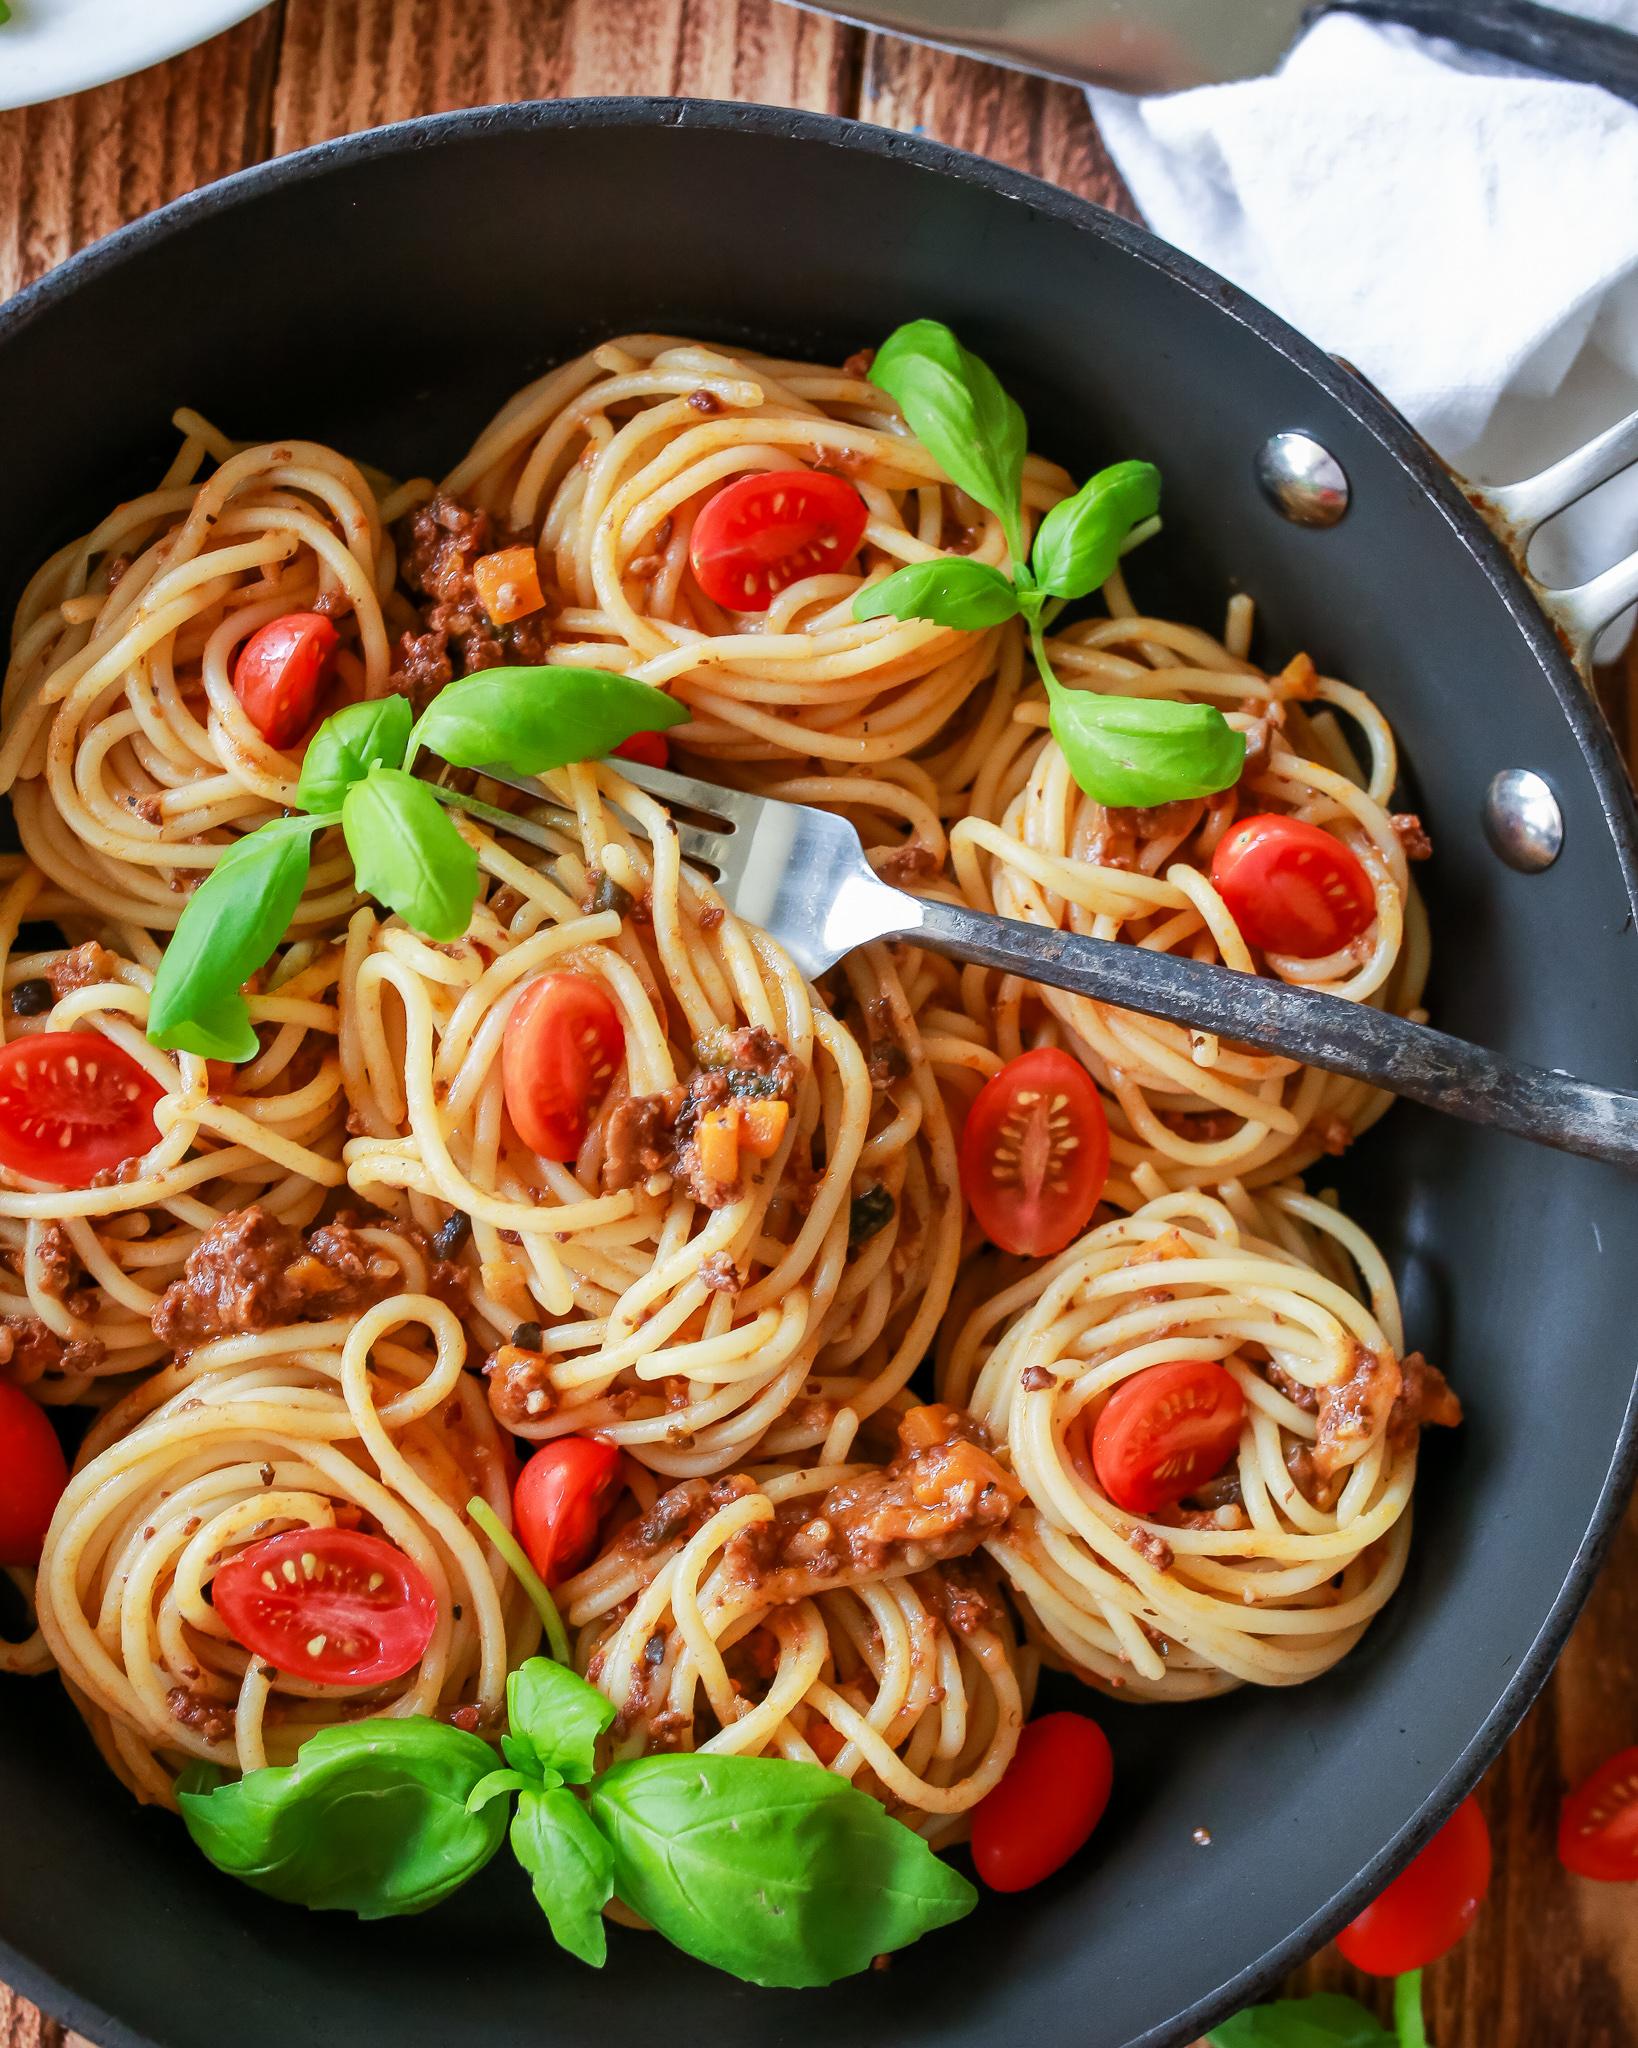 The best homemade spaghetti sauce recipe ever